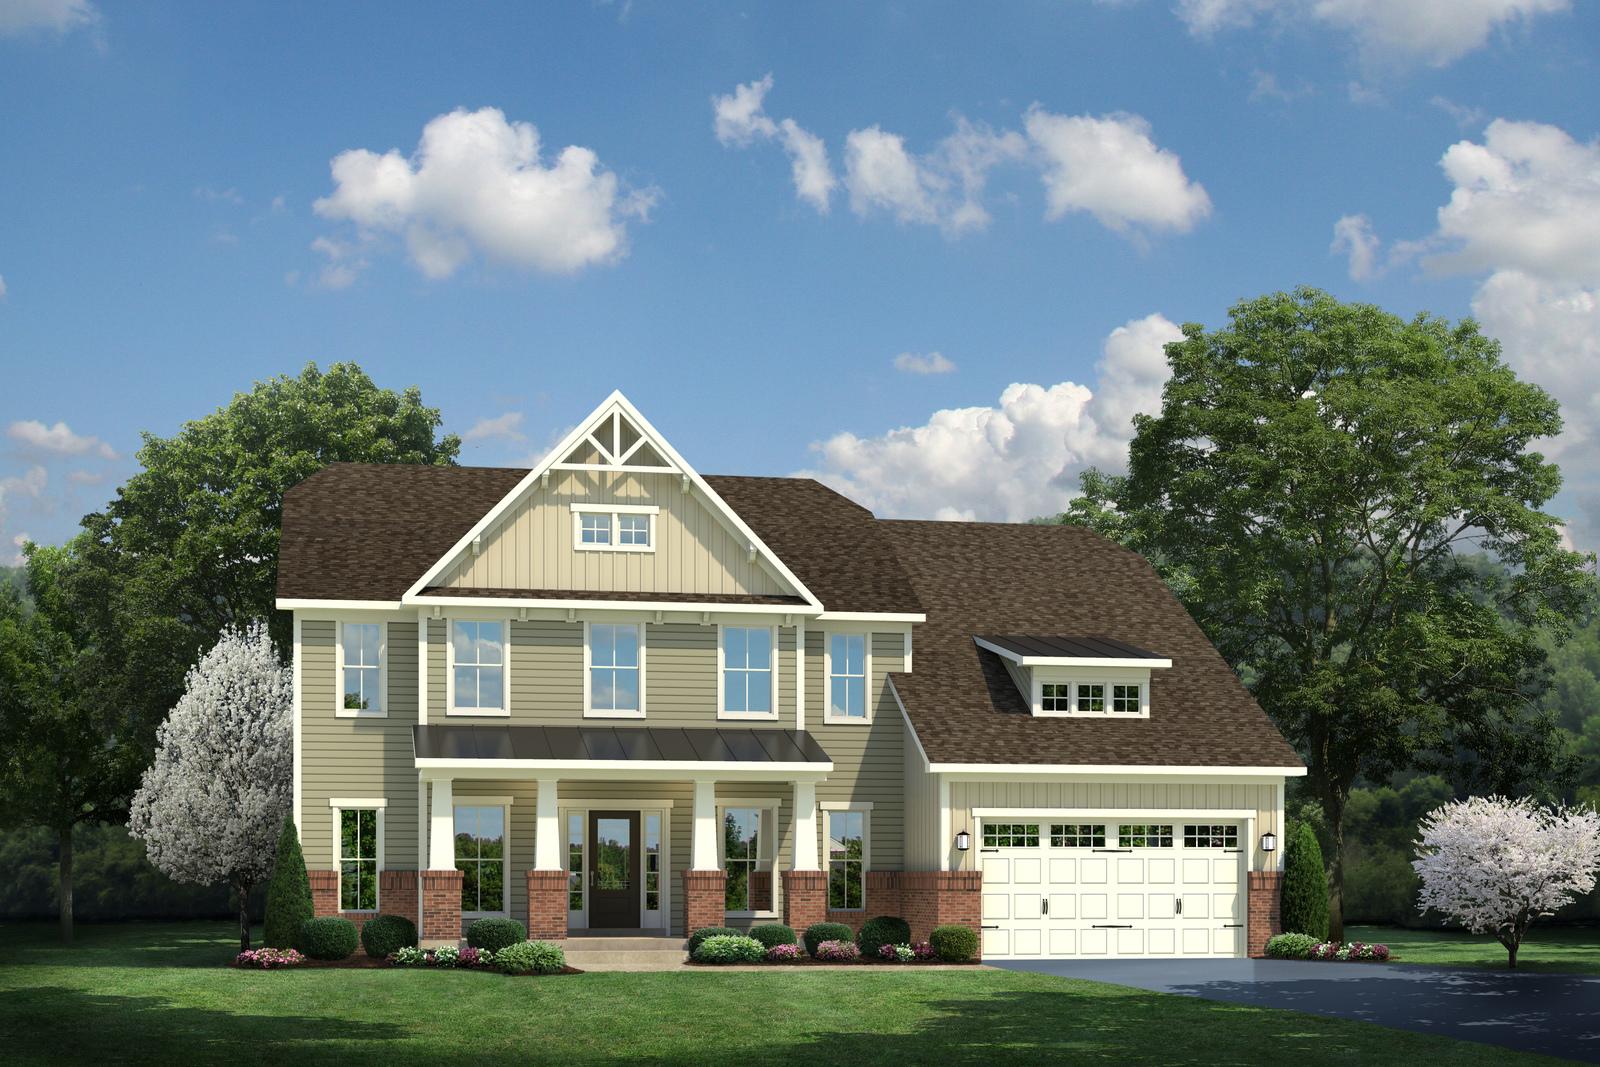 New Courtland Gate Home Model For Sale Heartland Homes